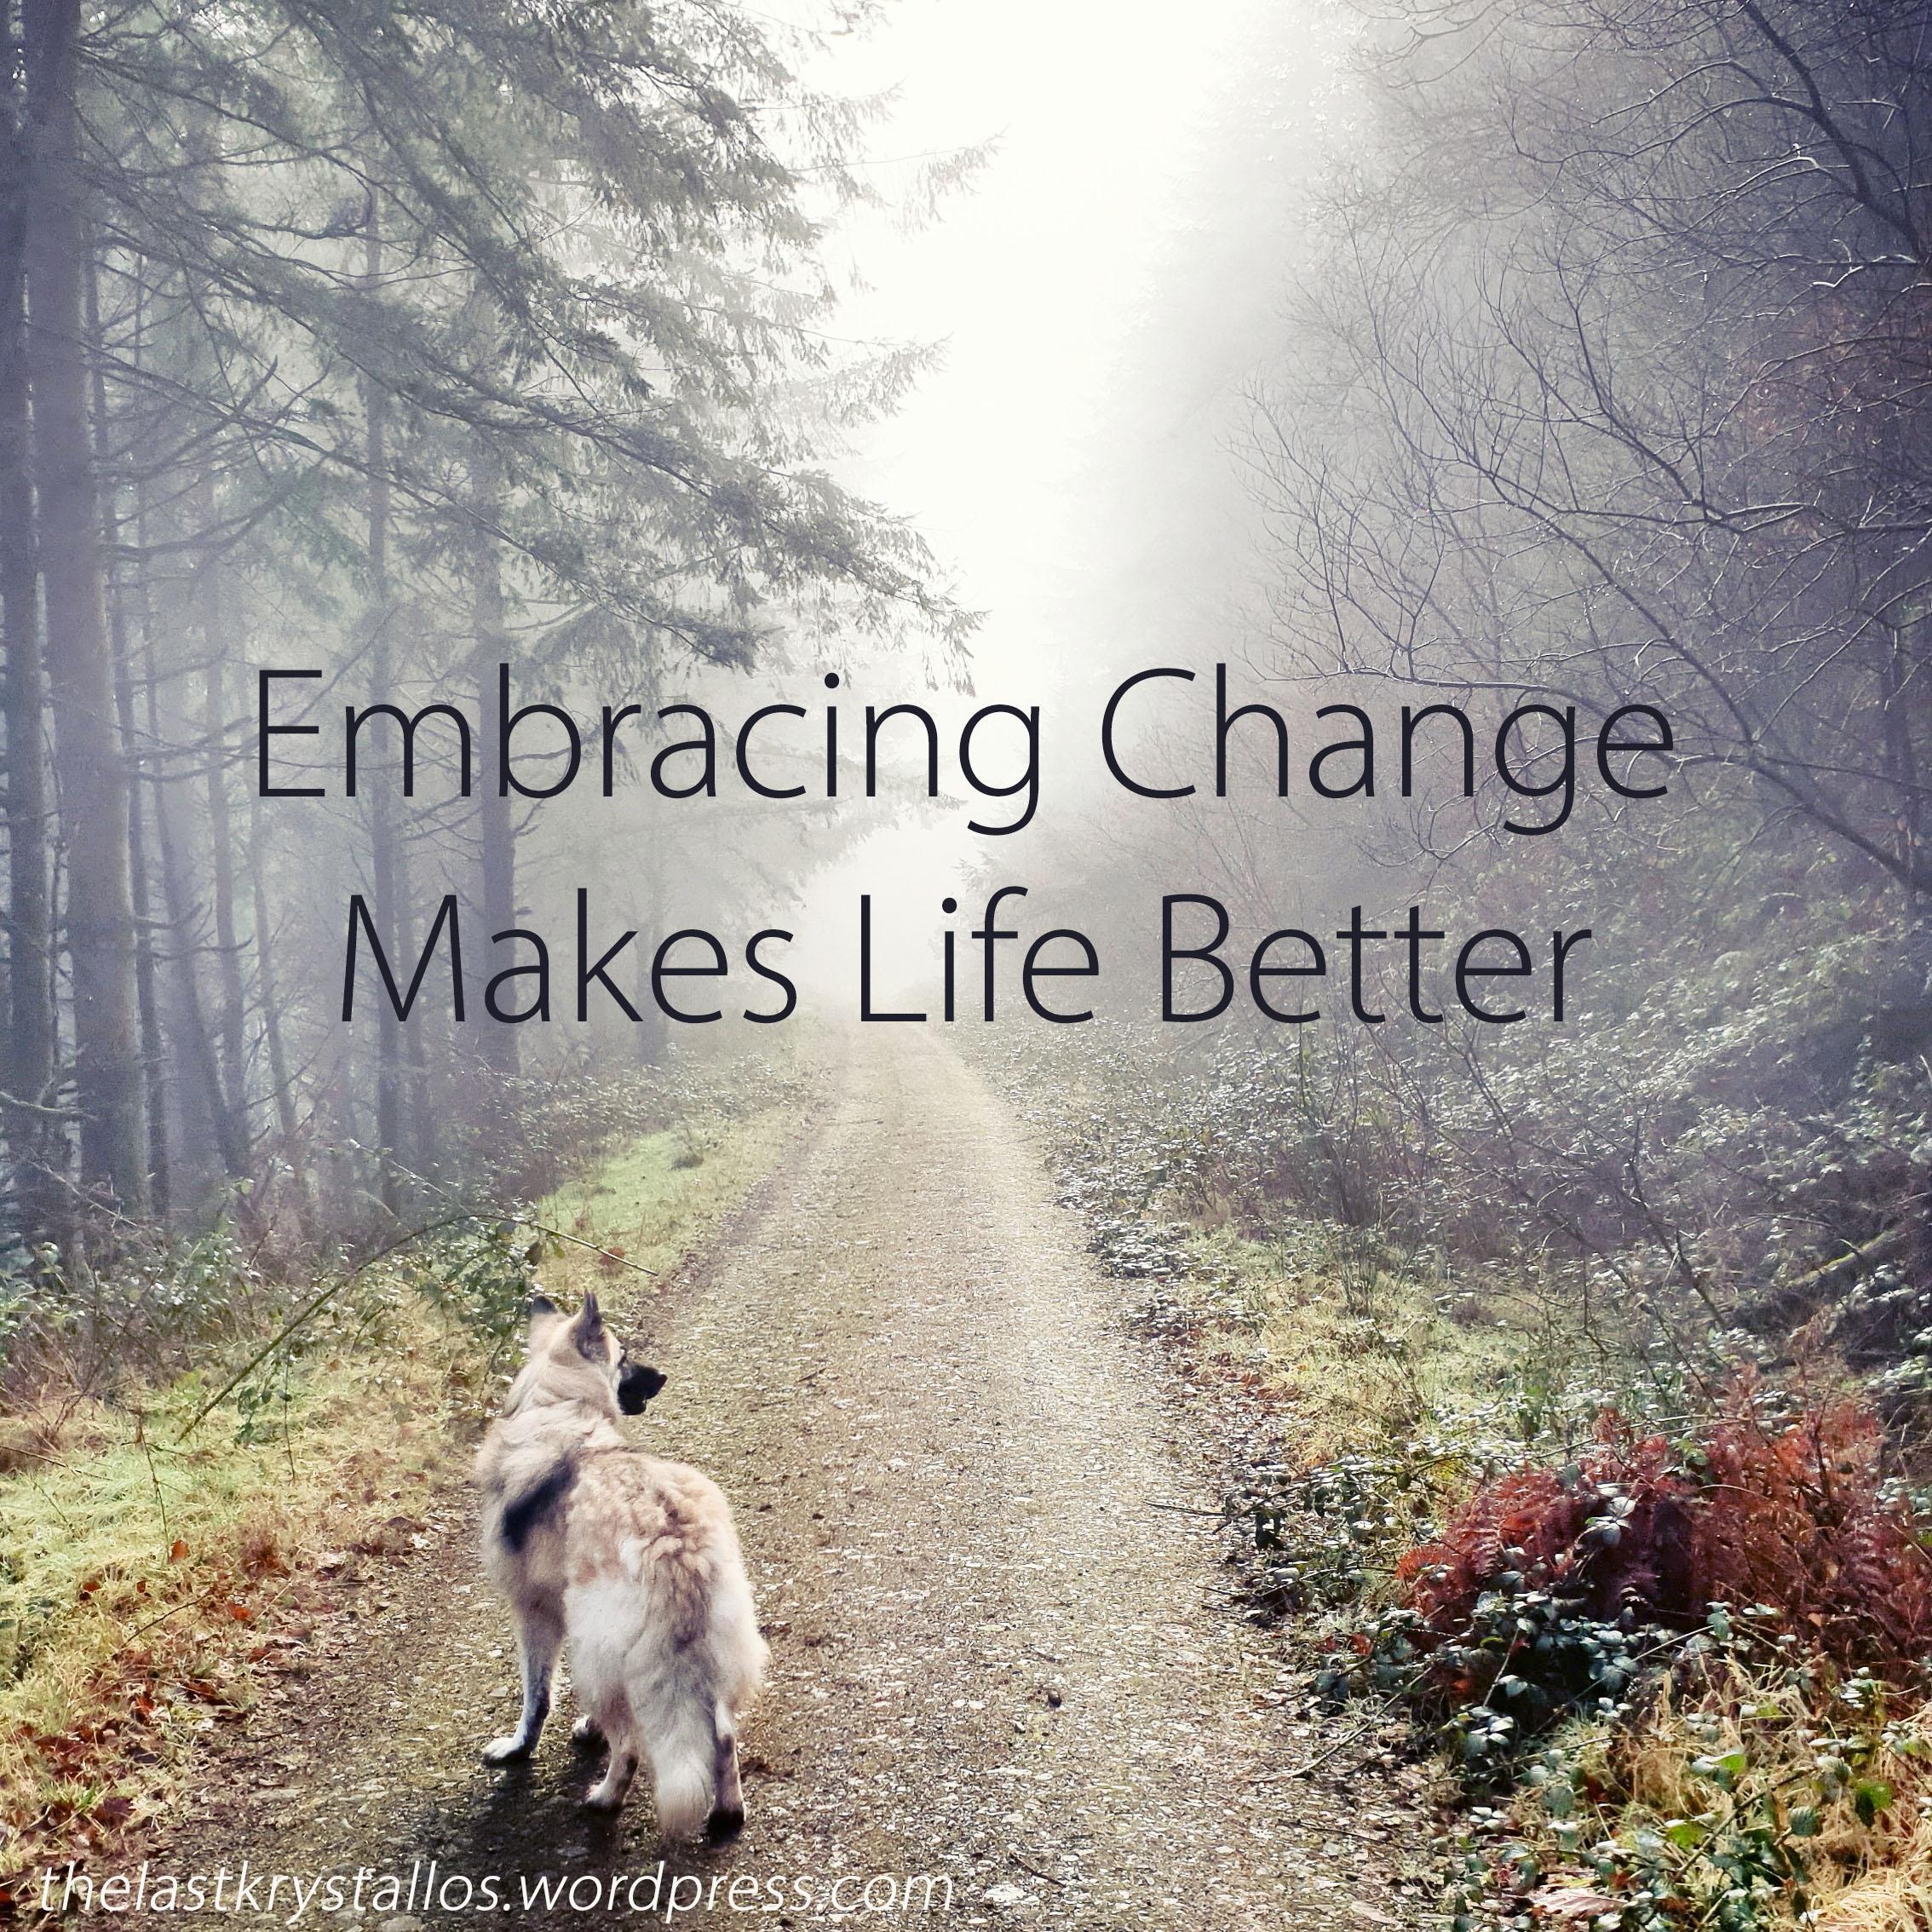 Embracing Change Makes Life Better - The Last Krystallos